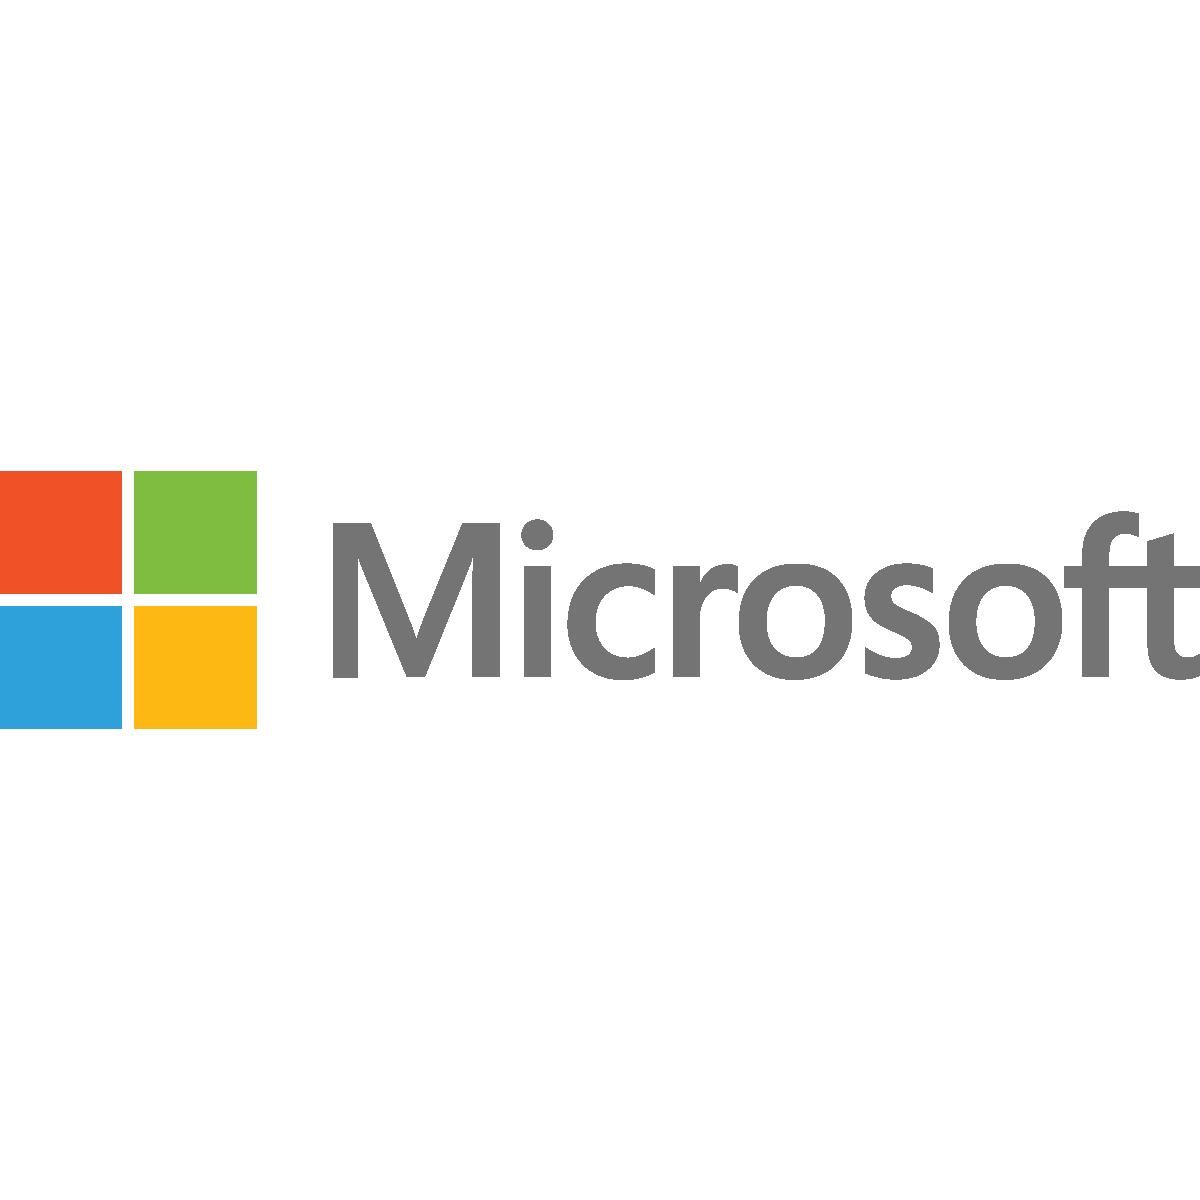 staciewebsite-logo_Microsoft.png